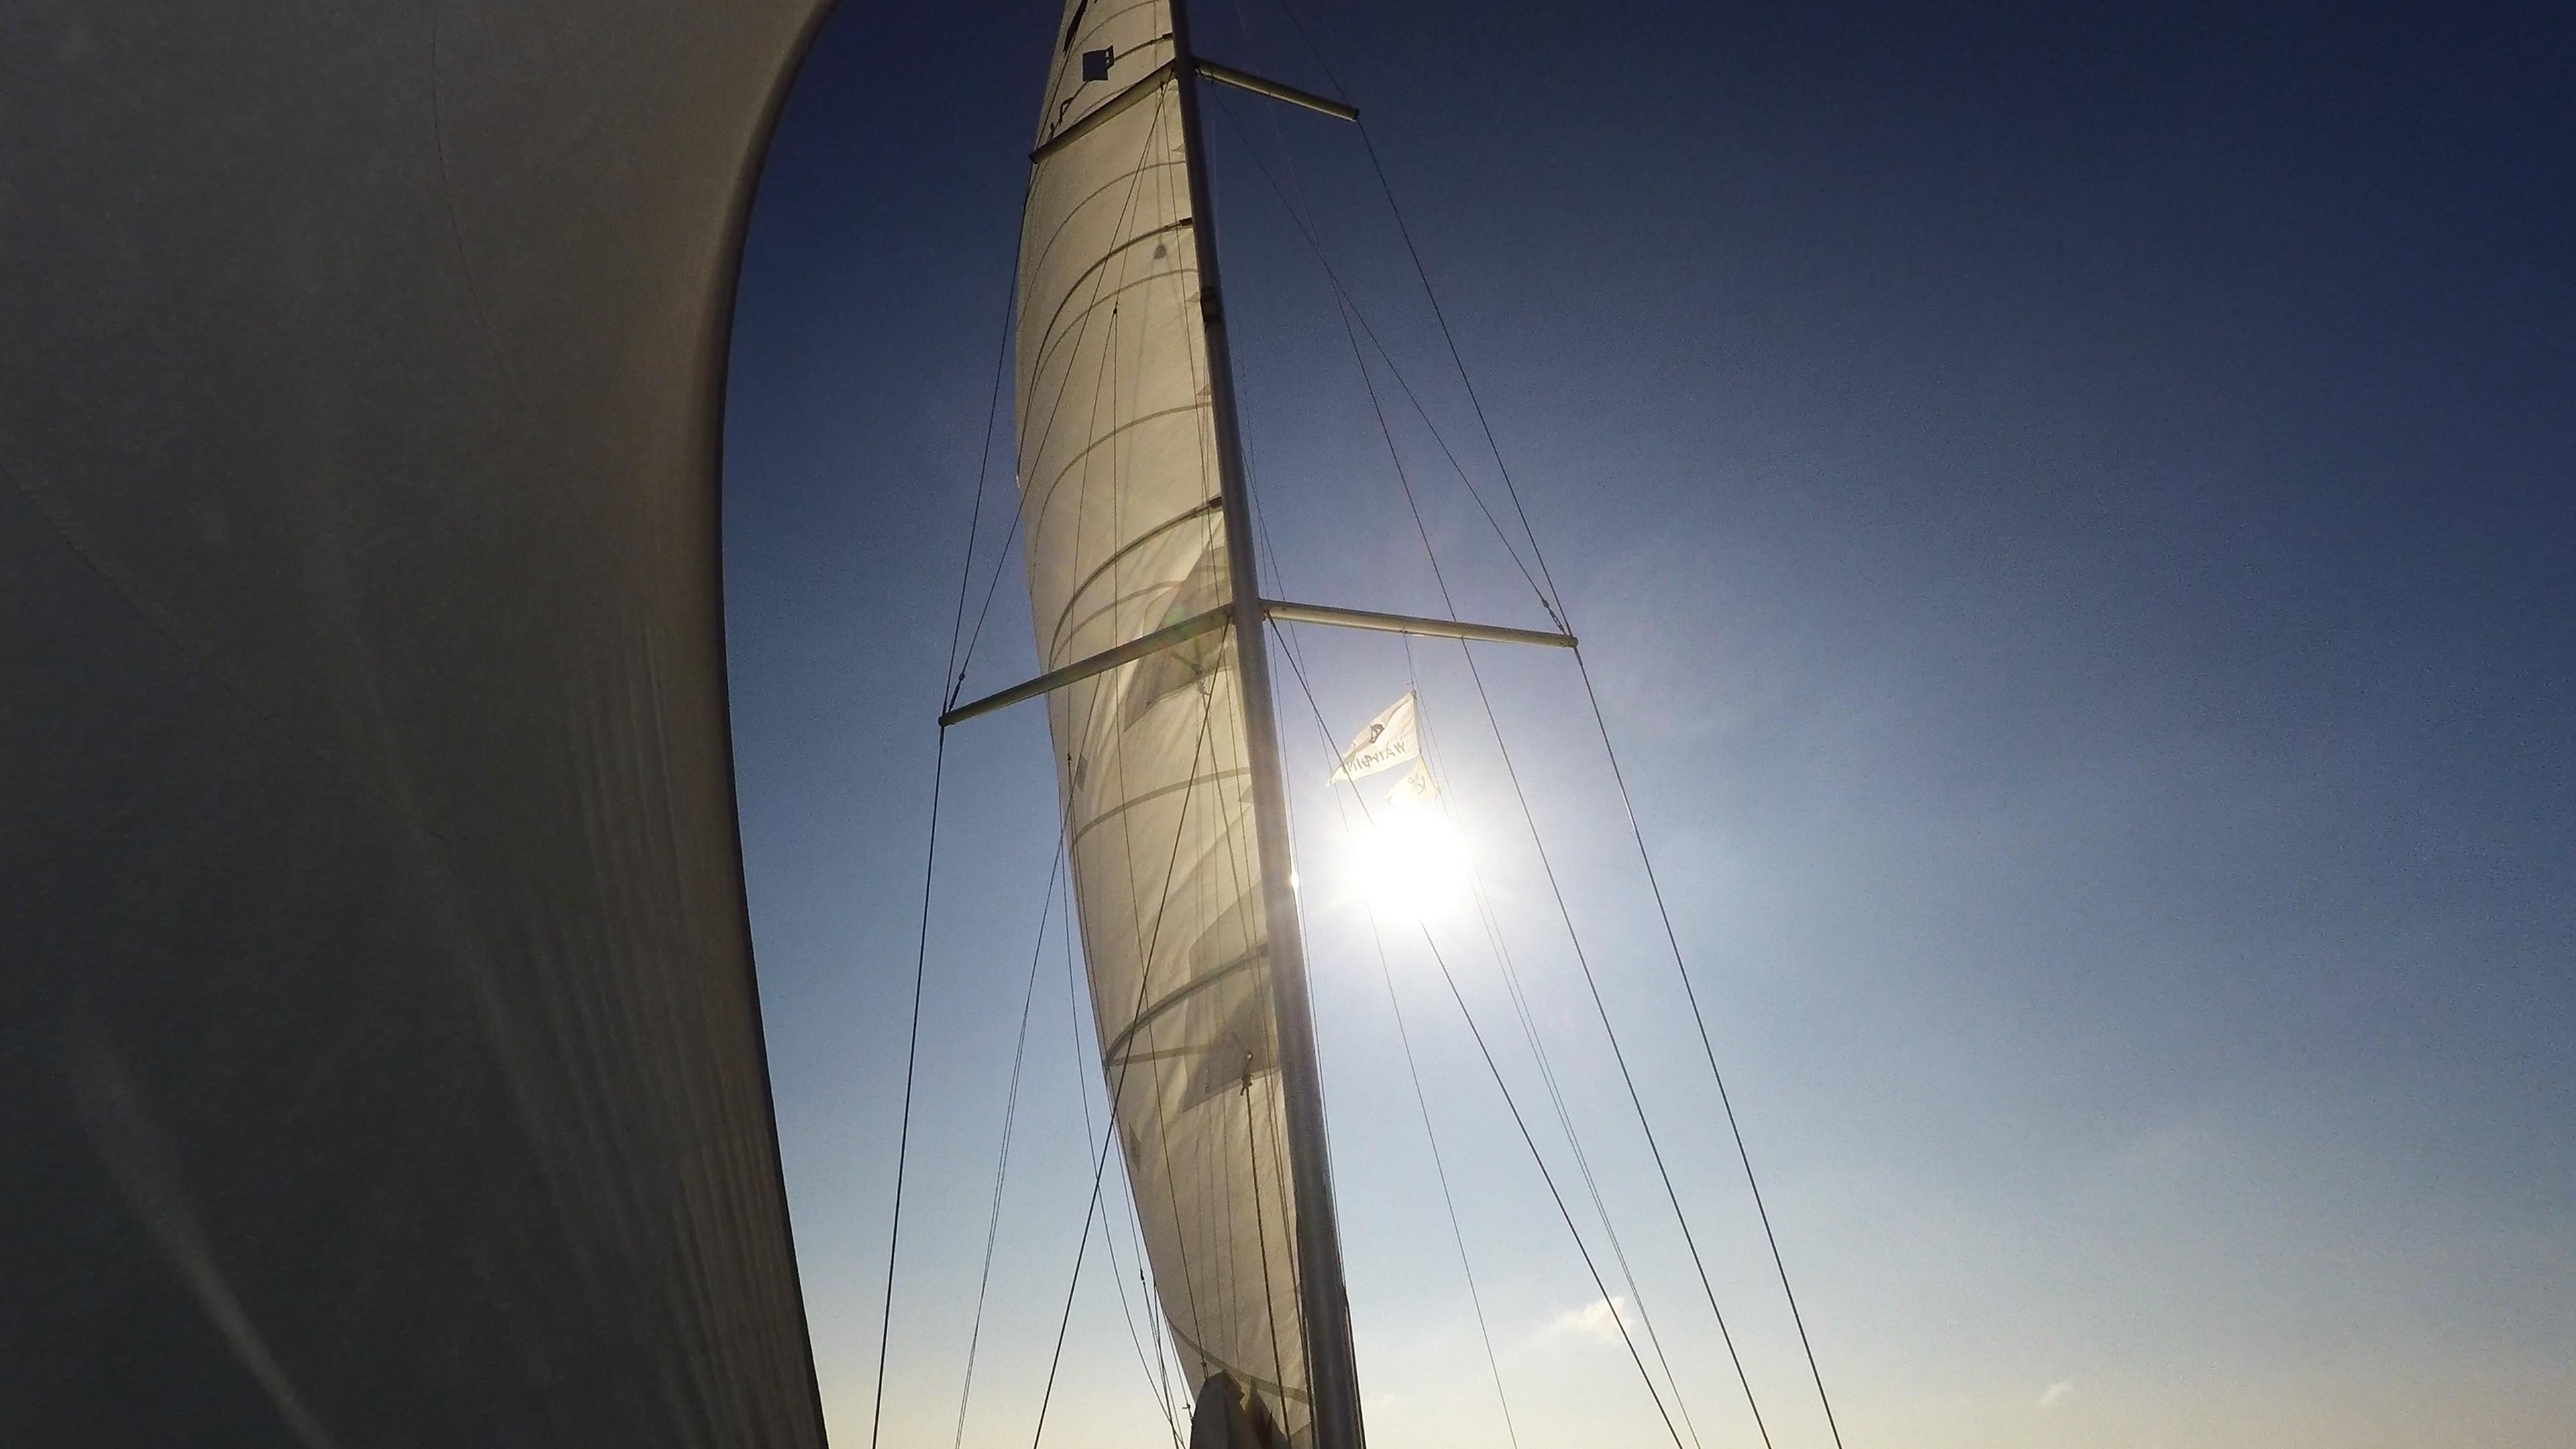 sailing yacht sails mast sailing yacht